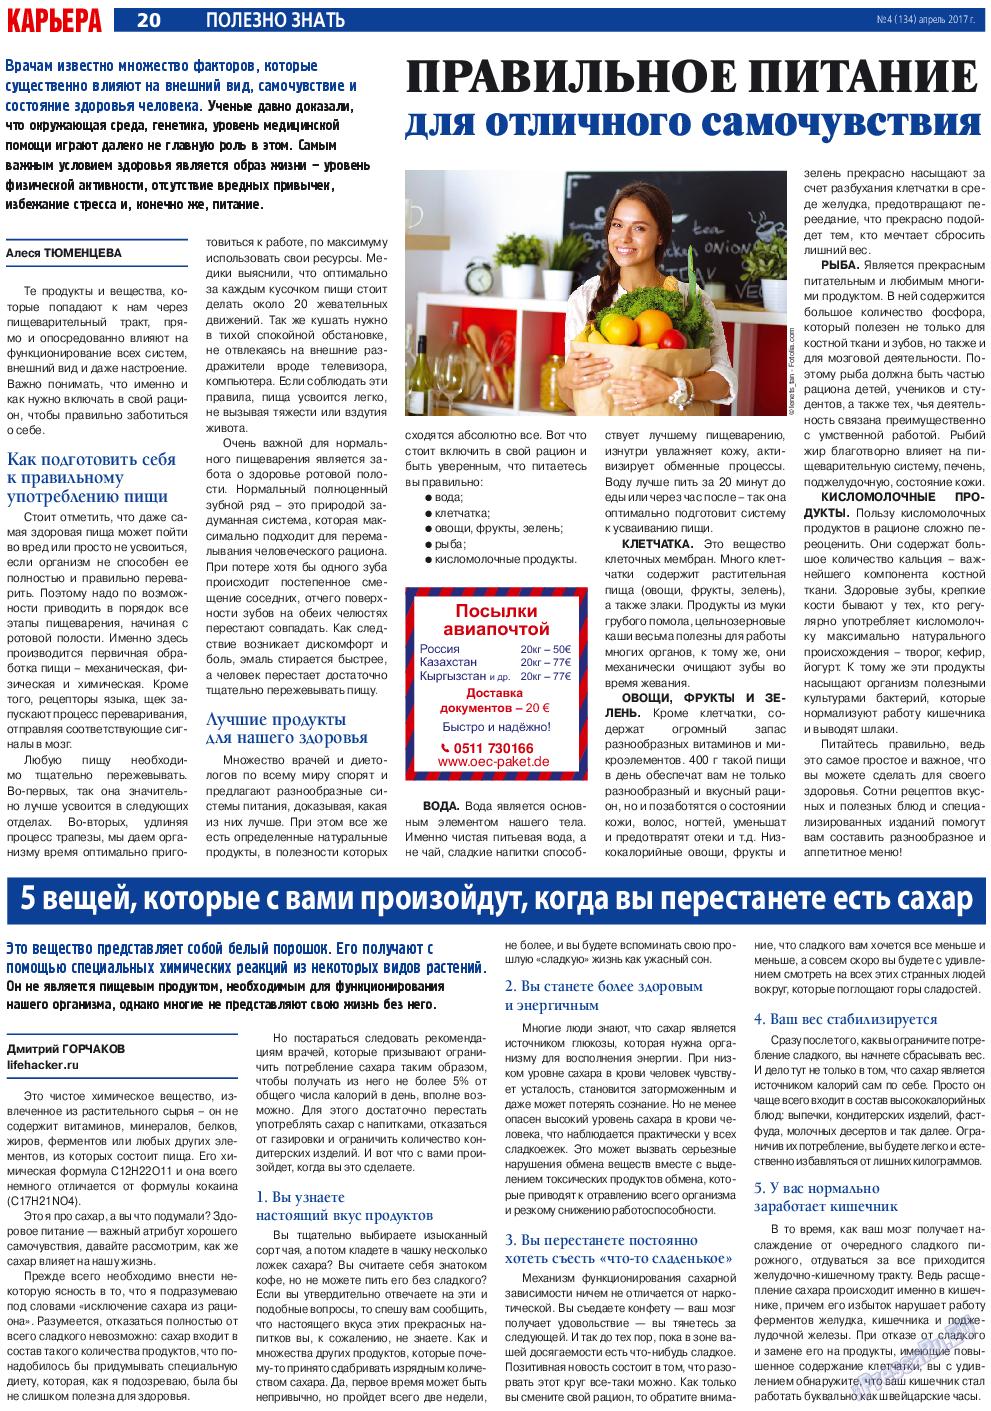 Карьера (газета). 2017 год, номер 4, стр. 20